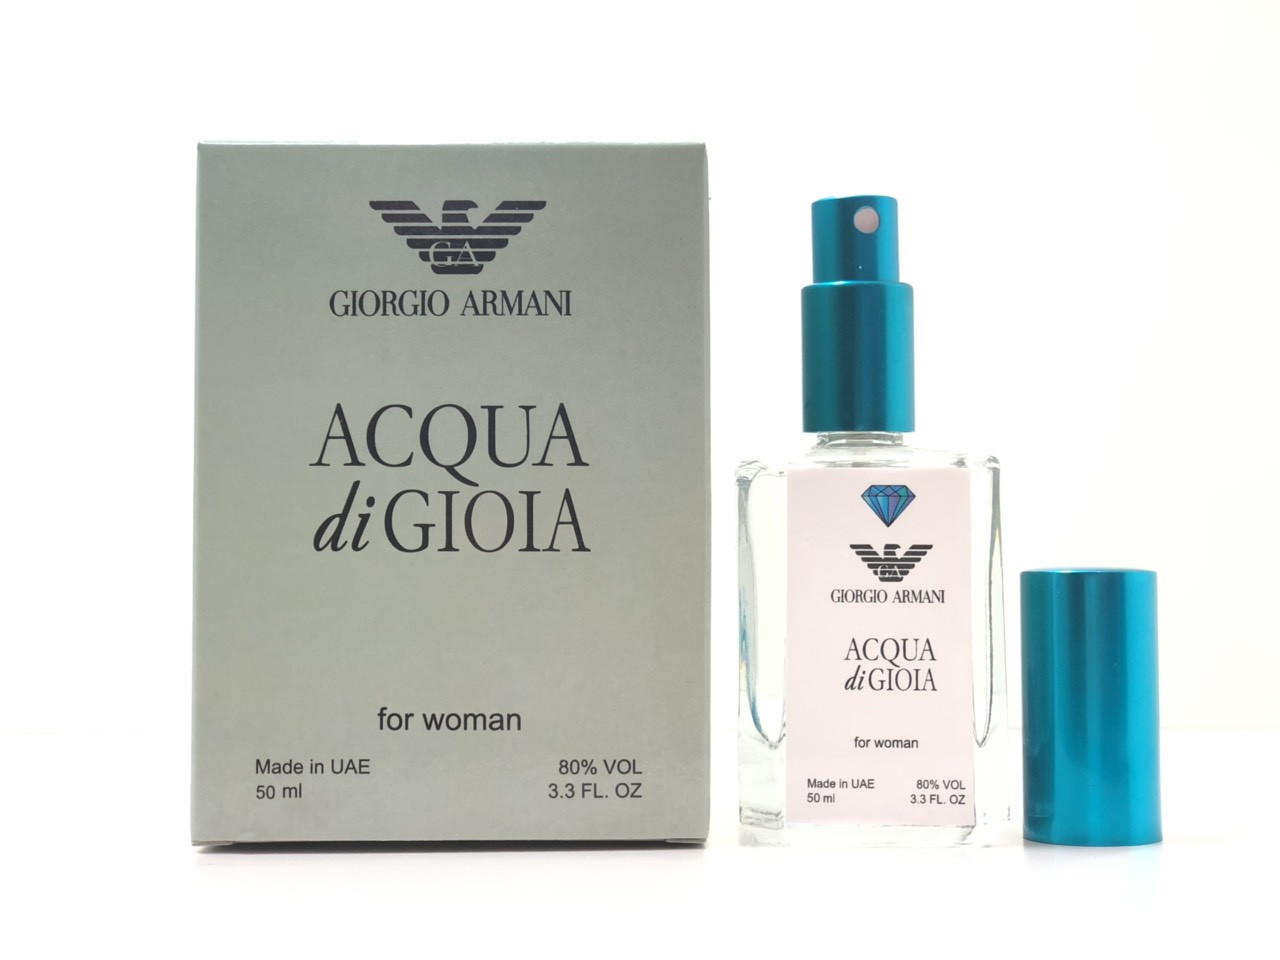 Парфюм для девушек мини Giorgio Armani Acqua di Gioia (Джорджио Армани Аква Ди Джиола) 50 мл Diamond - реплика